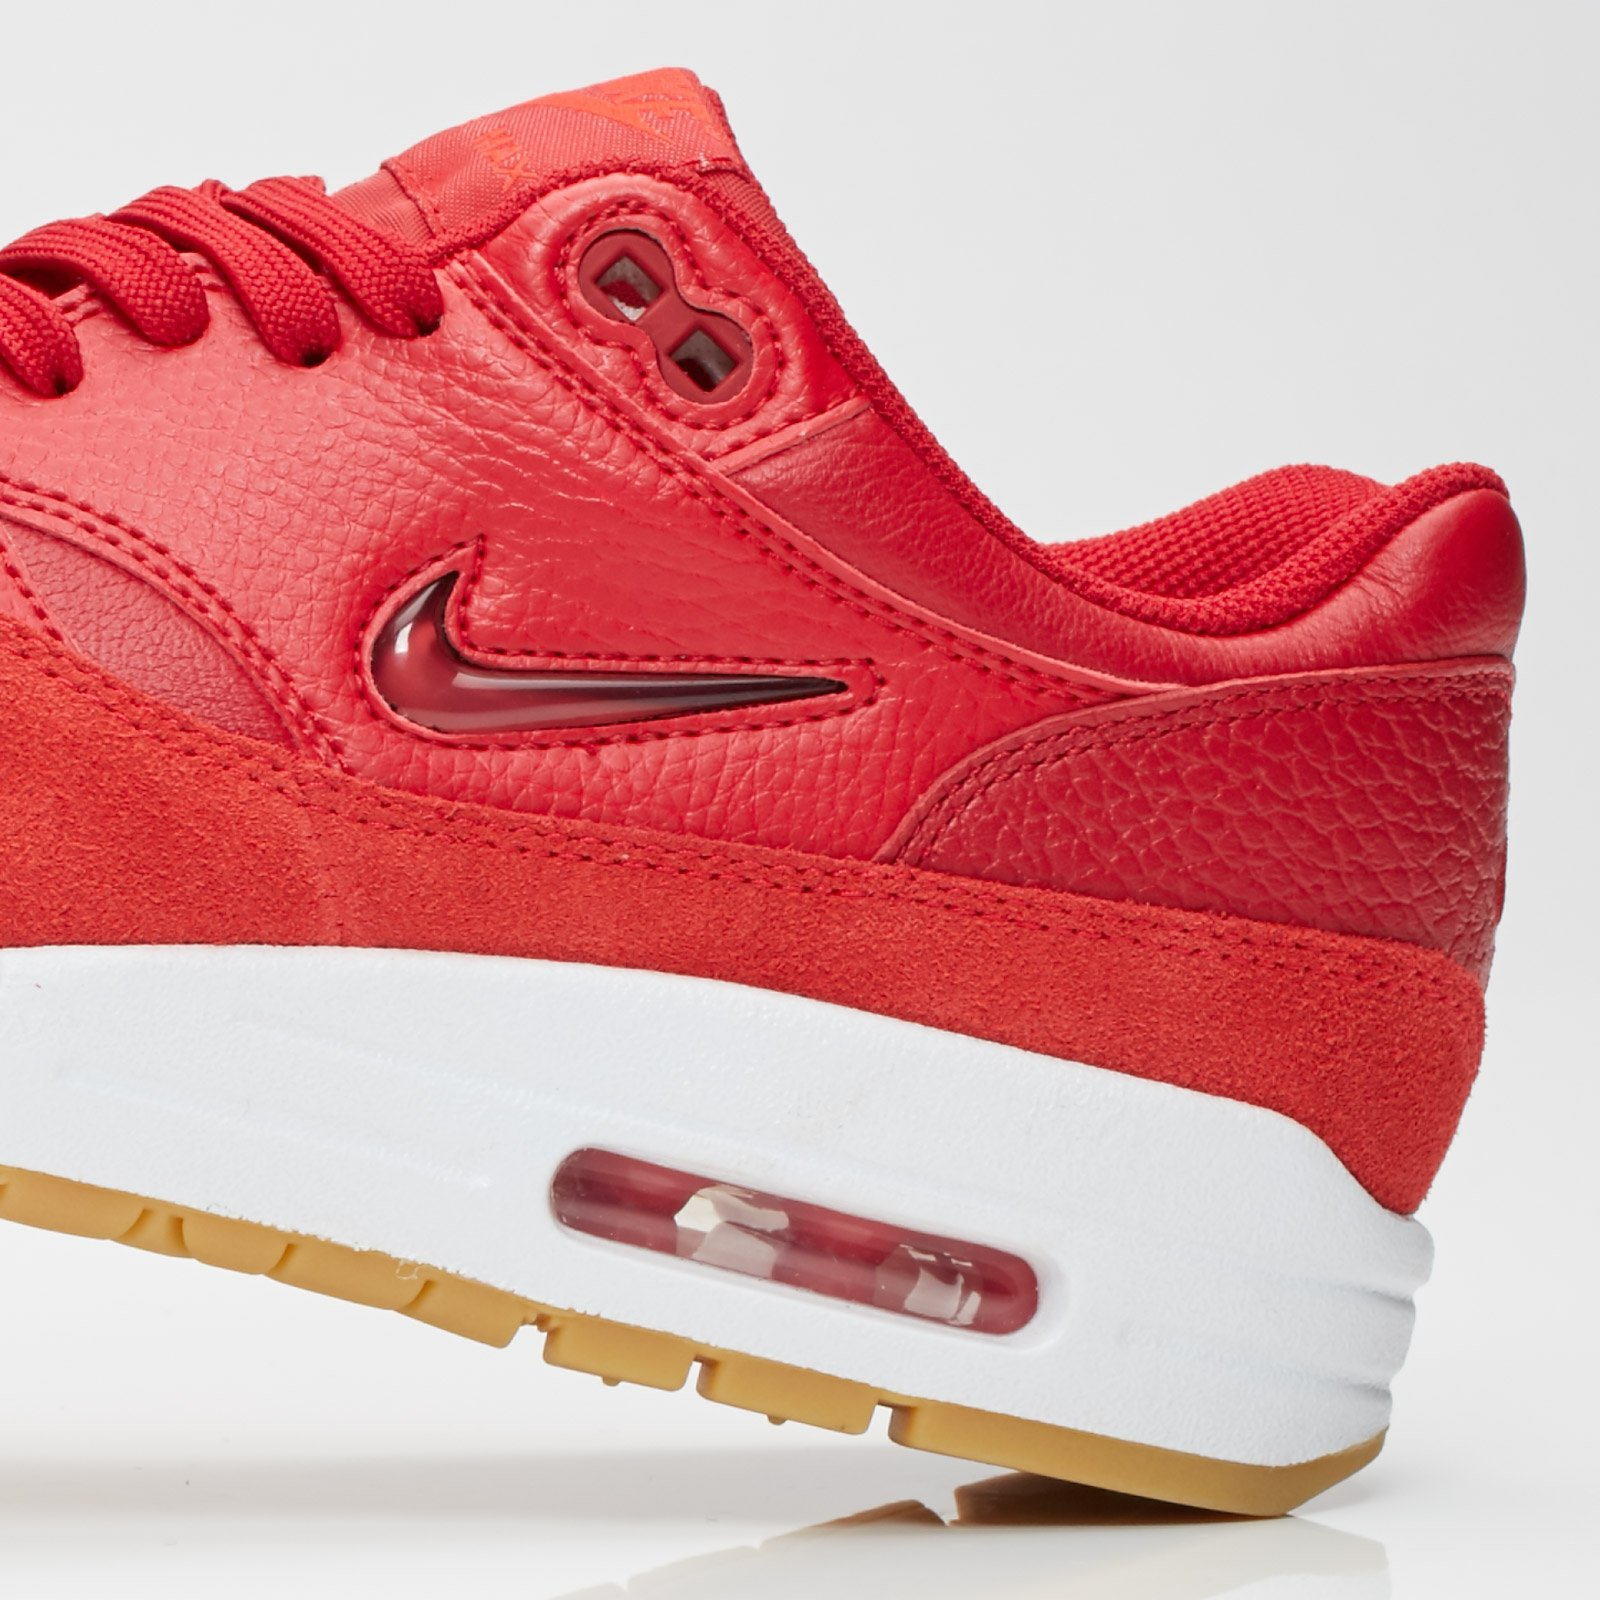 Sociología Dinamarca Christchurch  Nike Wmns Air Max 1 Premium SC - Aa0512-602 - Sneakersnstuff | sneakers &  streetwear online since 1999